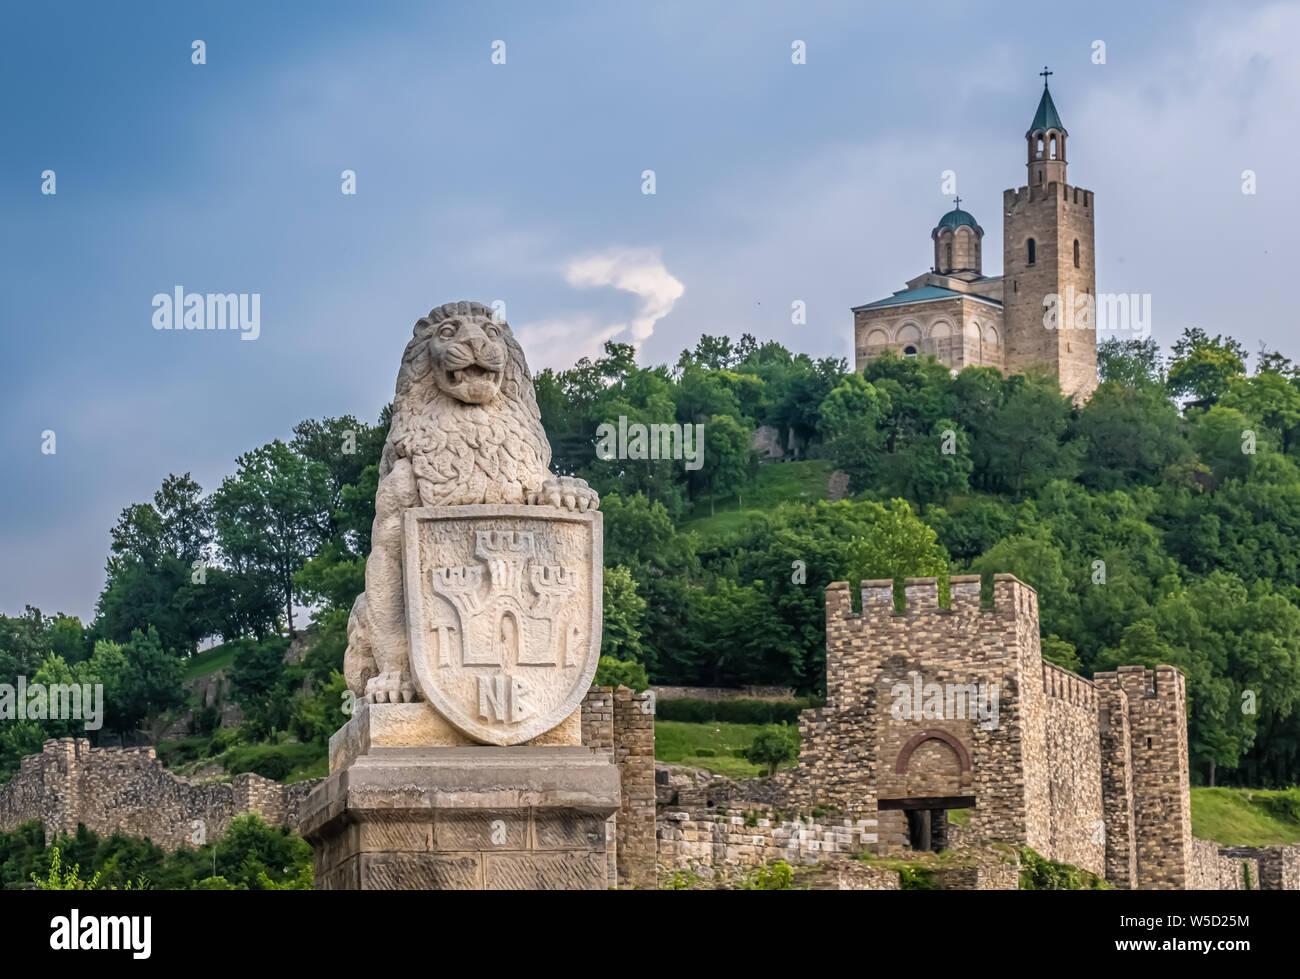 The medieval Tsarevets fortress, Veliko Tarnovo, Bulgaria. It was the capital of the Second Bulgarian Kingdom Stock Photo